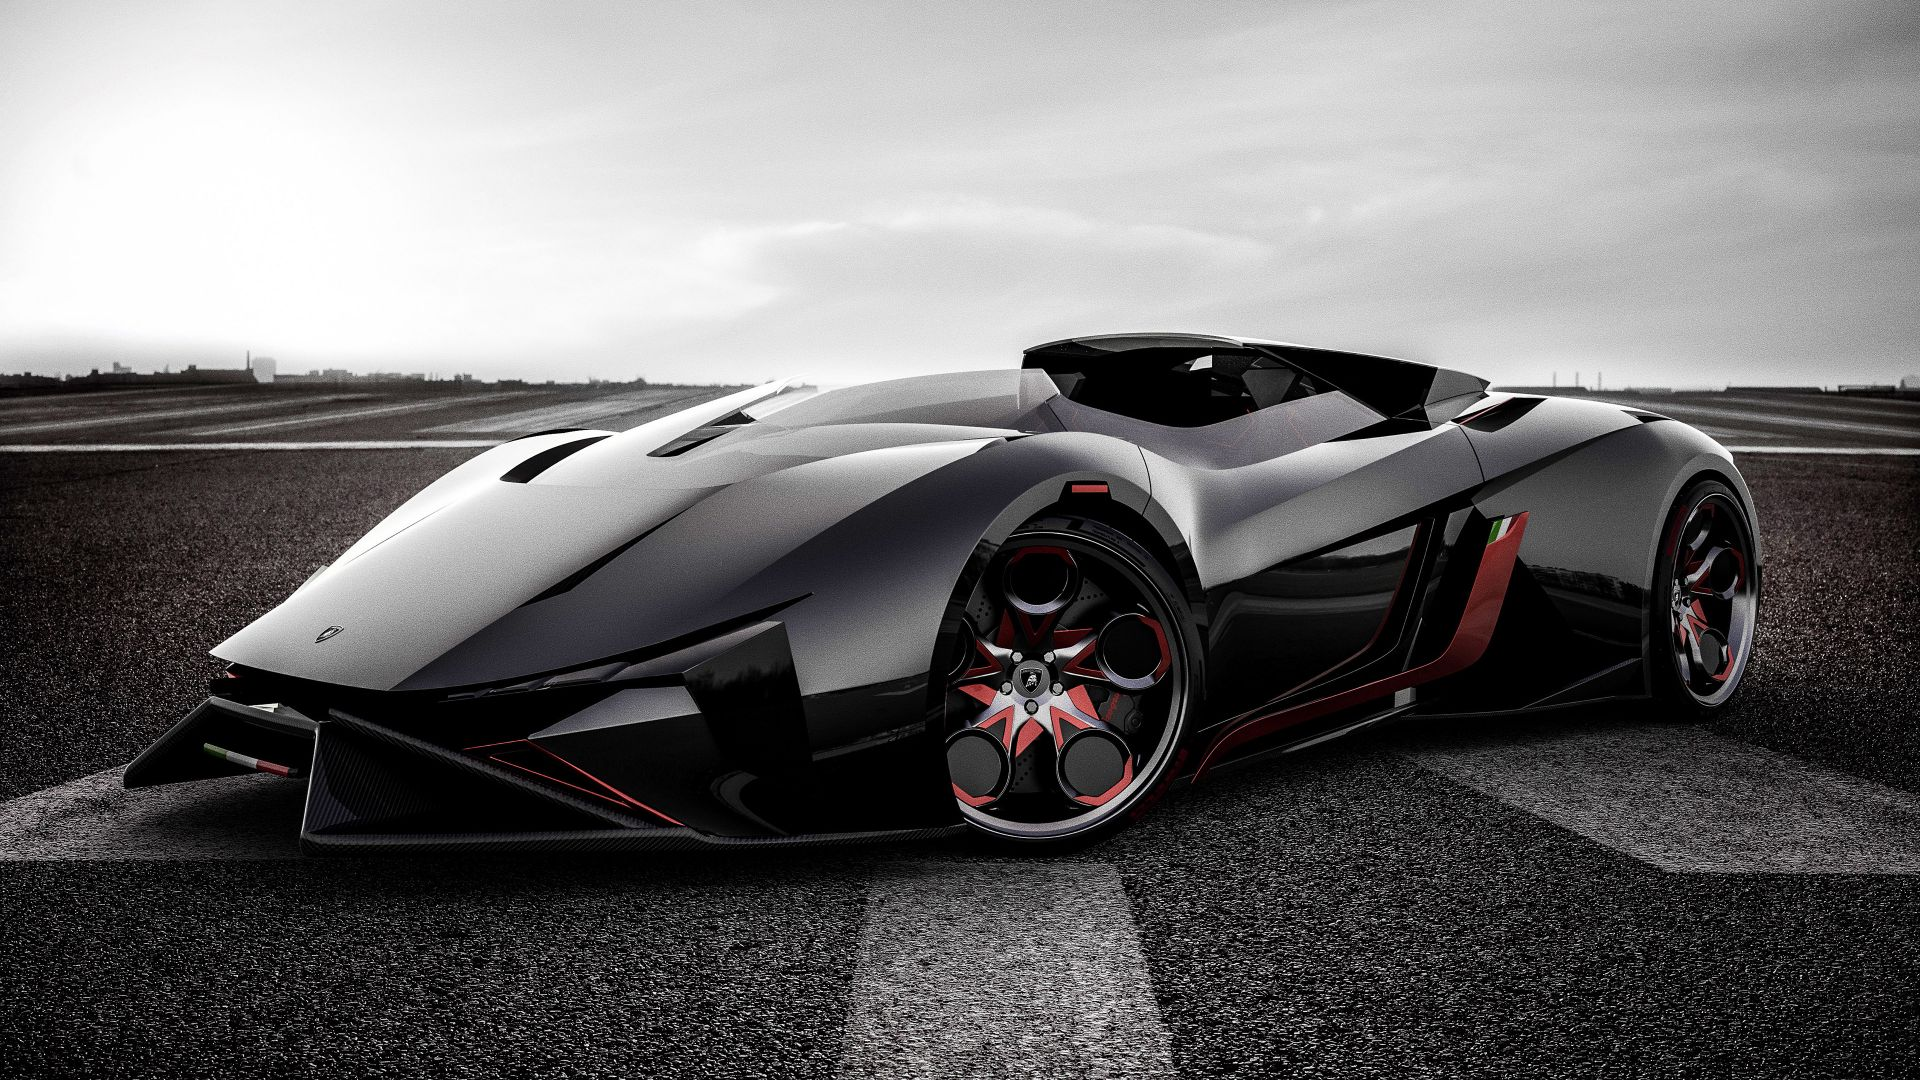 Wallpaper Lamborghini Diamante, sports car, Concept car, 4k